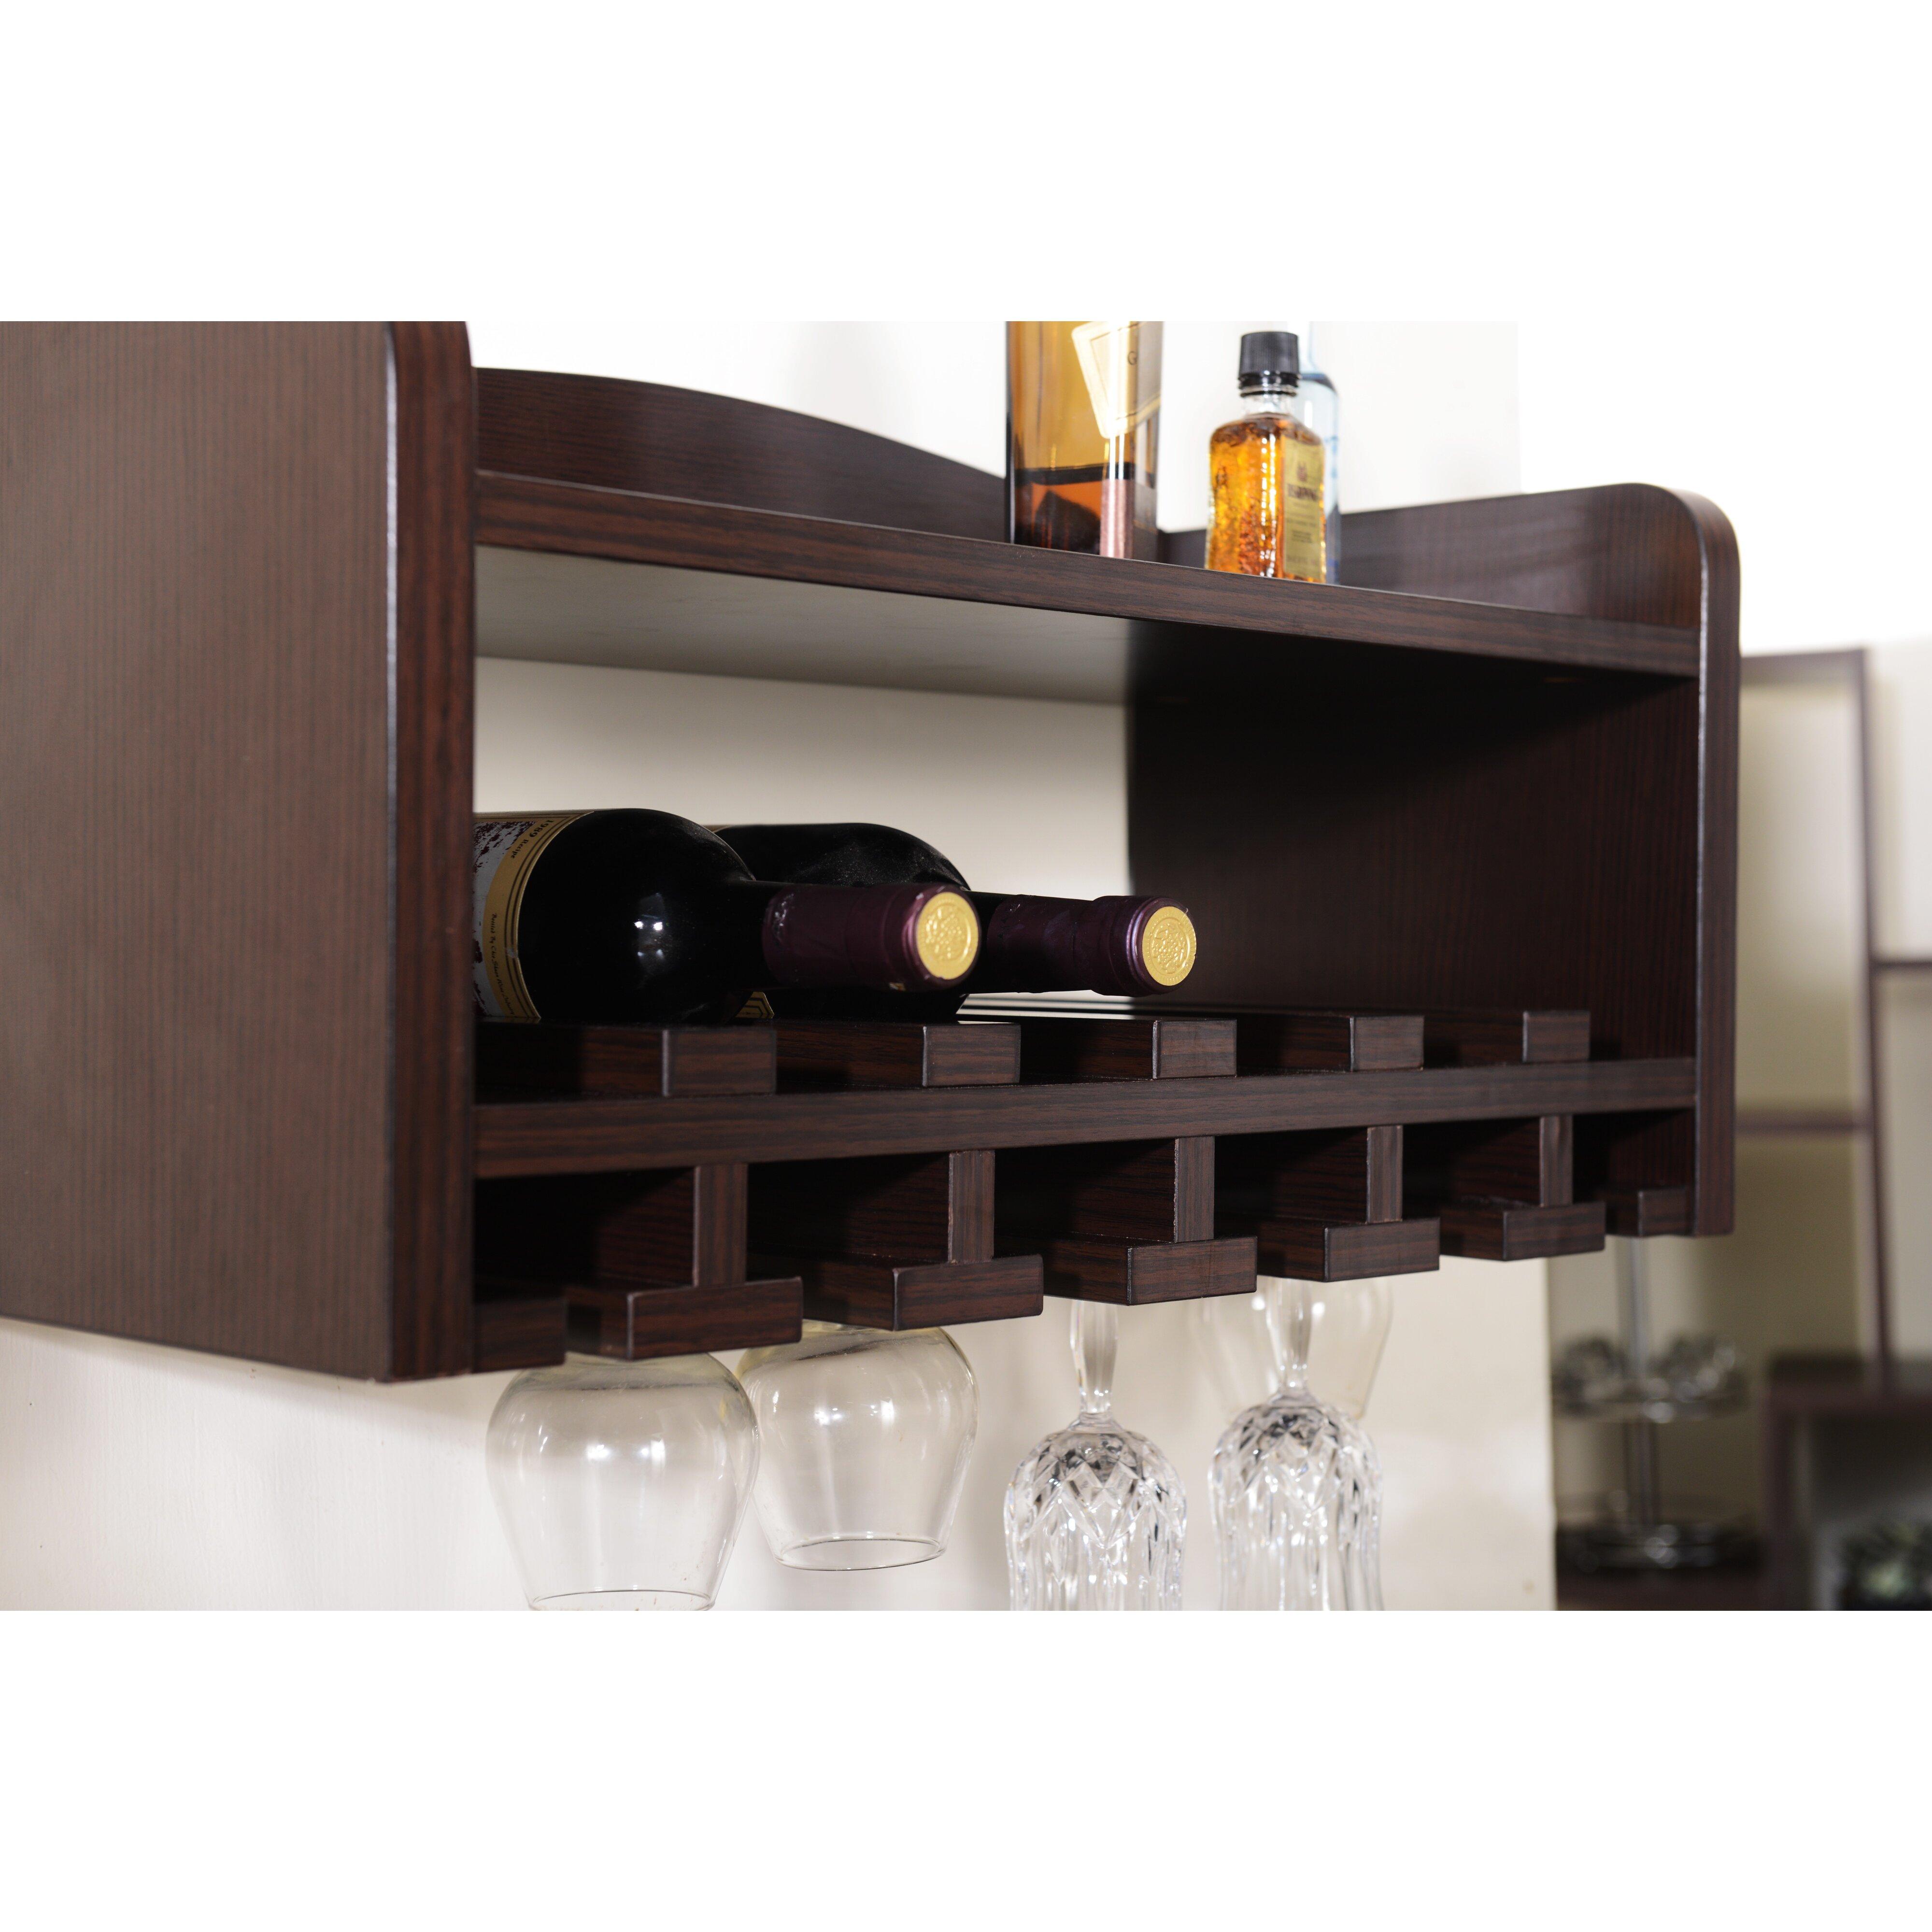 Darby Home Co Sullivan 6 Bottle Wall Mounted Wine Rack